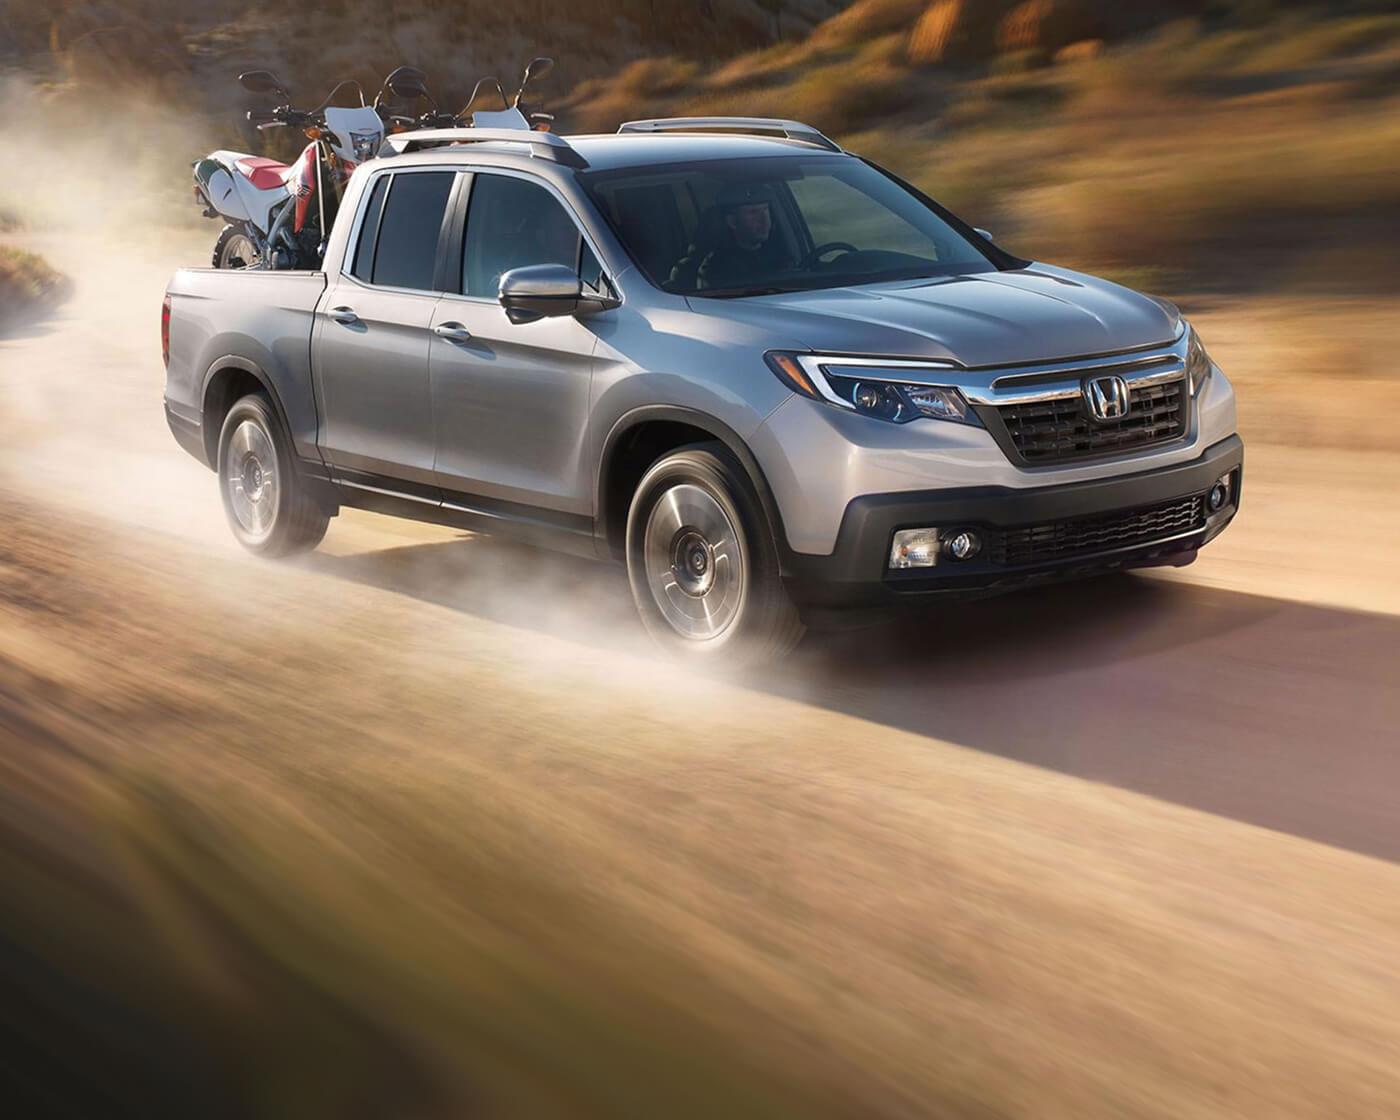 2017 honda ridgeline western washington honda dealers for Honda dealers in washington state